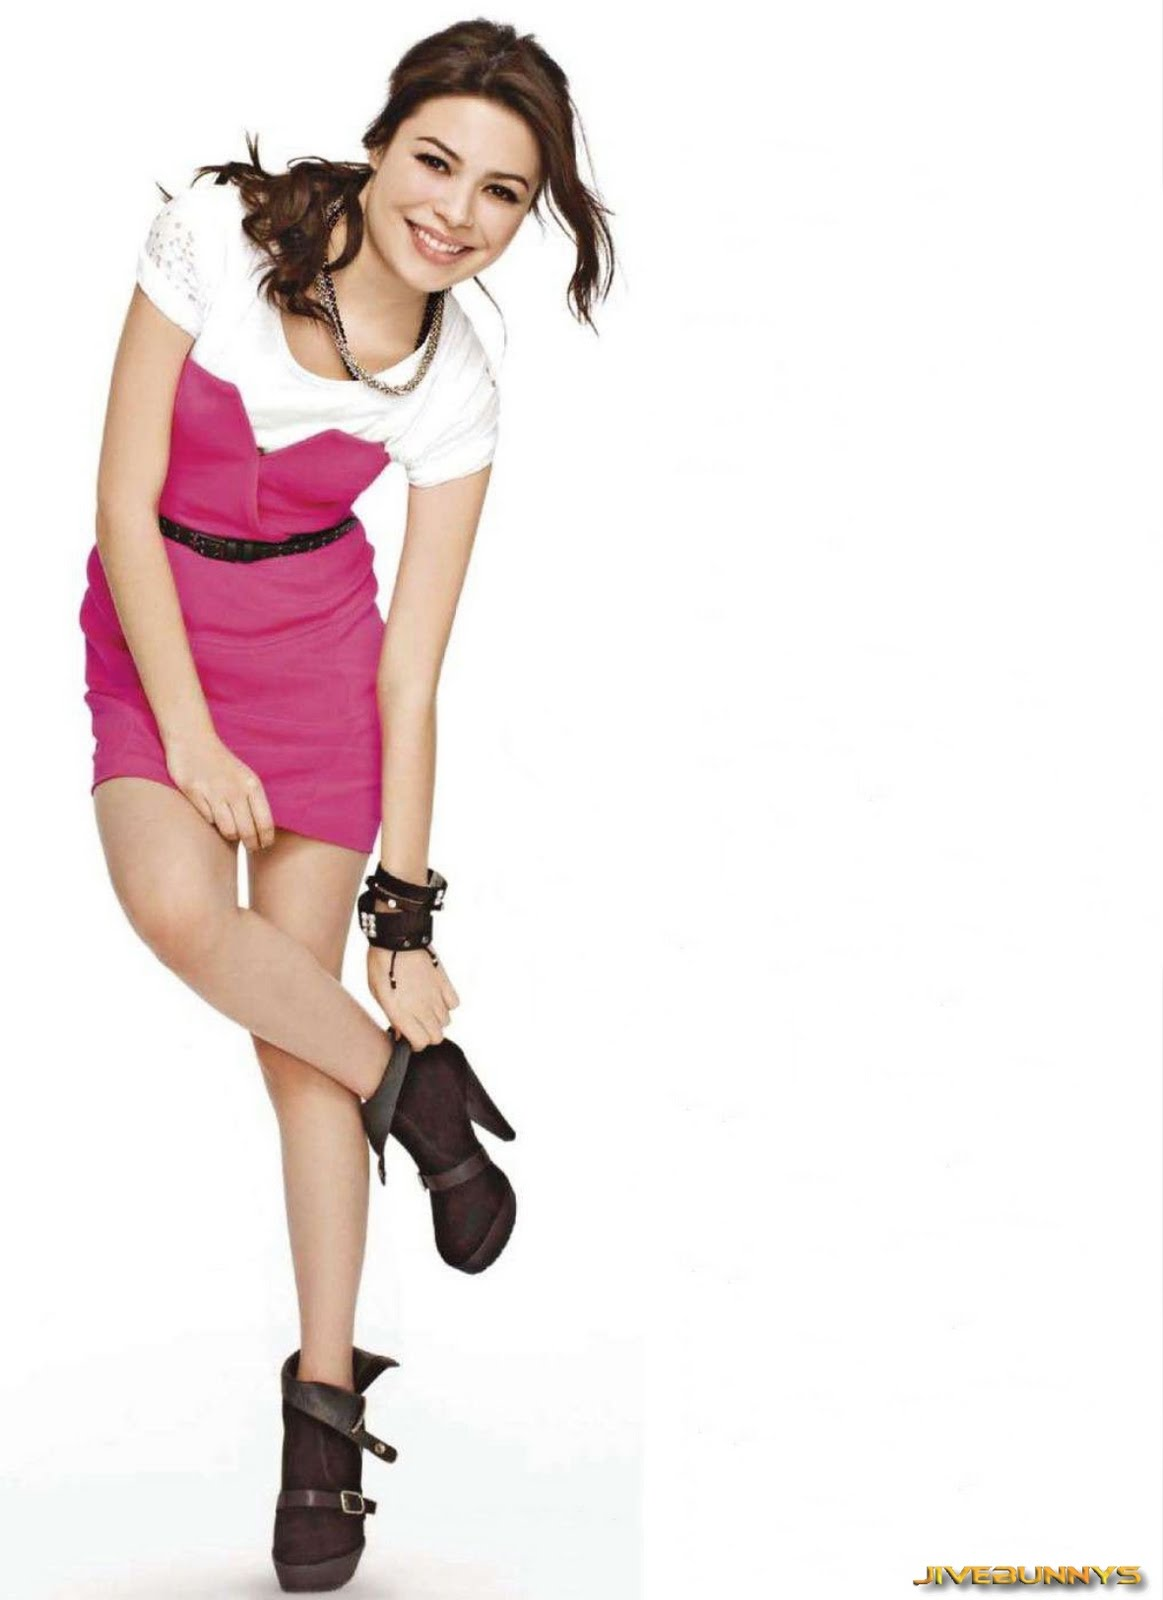 Miranda Cosgrove new photoshoot! - YouTube |Miranda Cosgrove 2012 Photoshoot